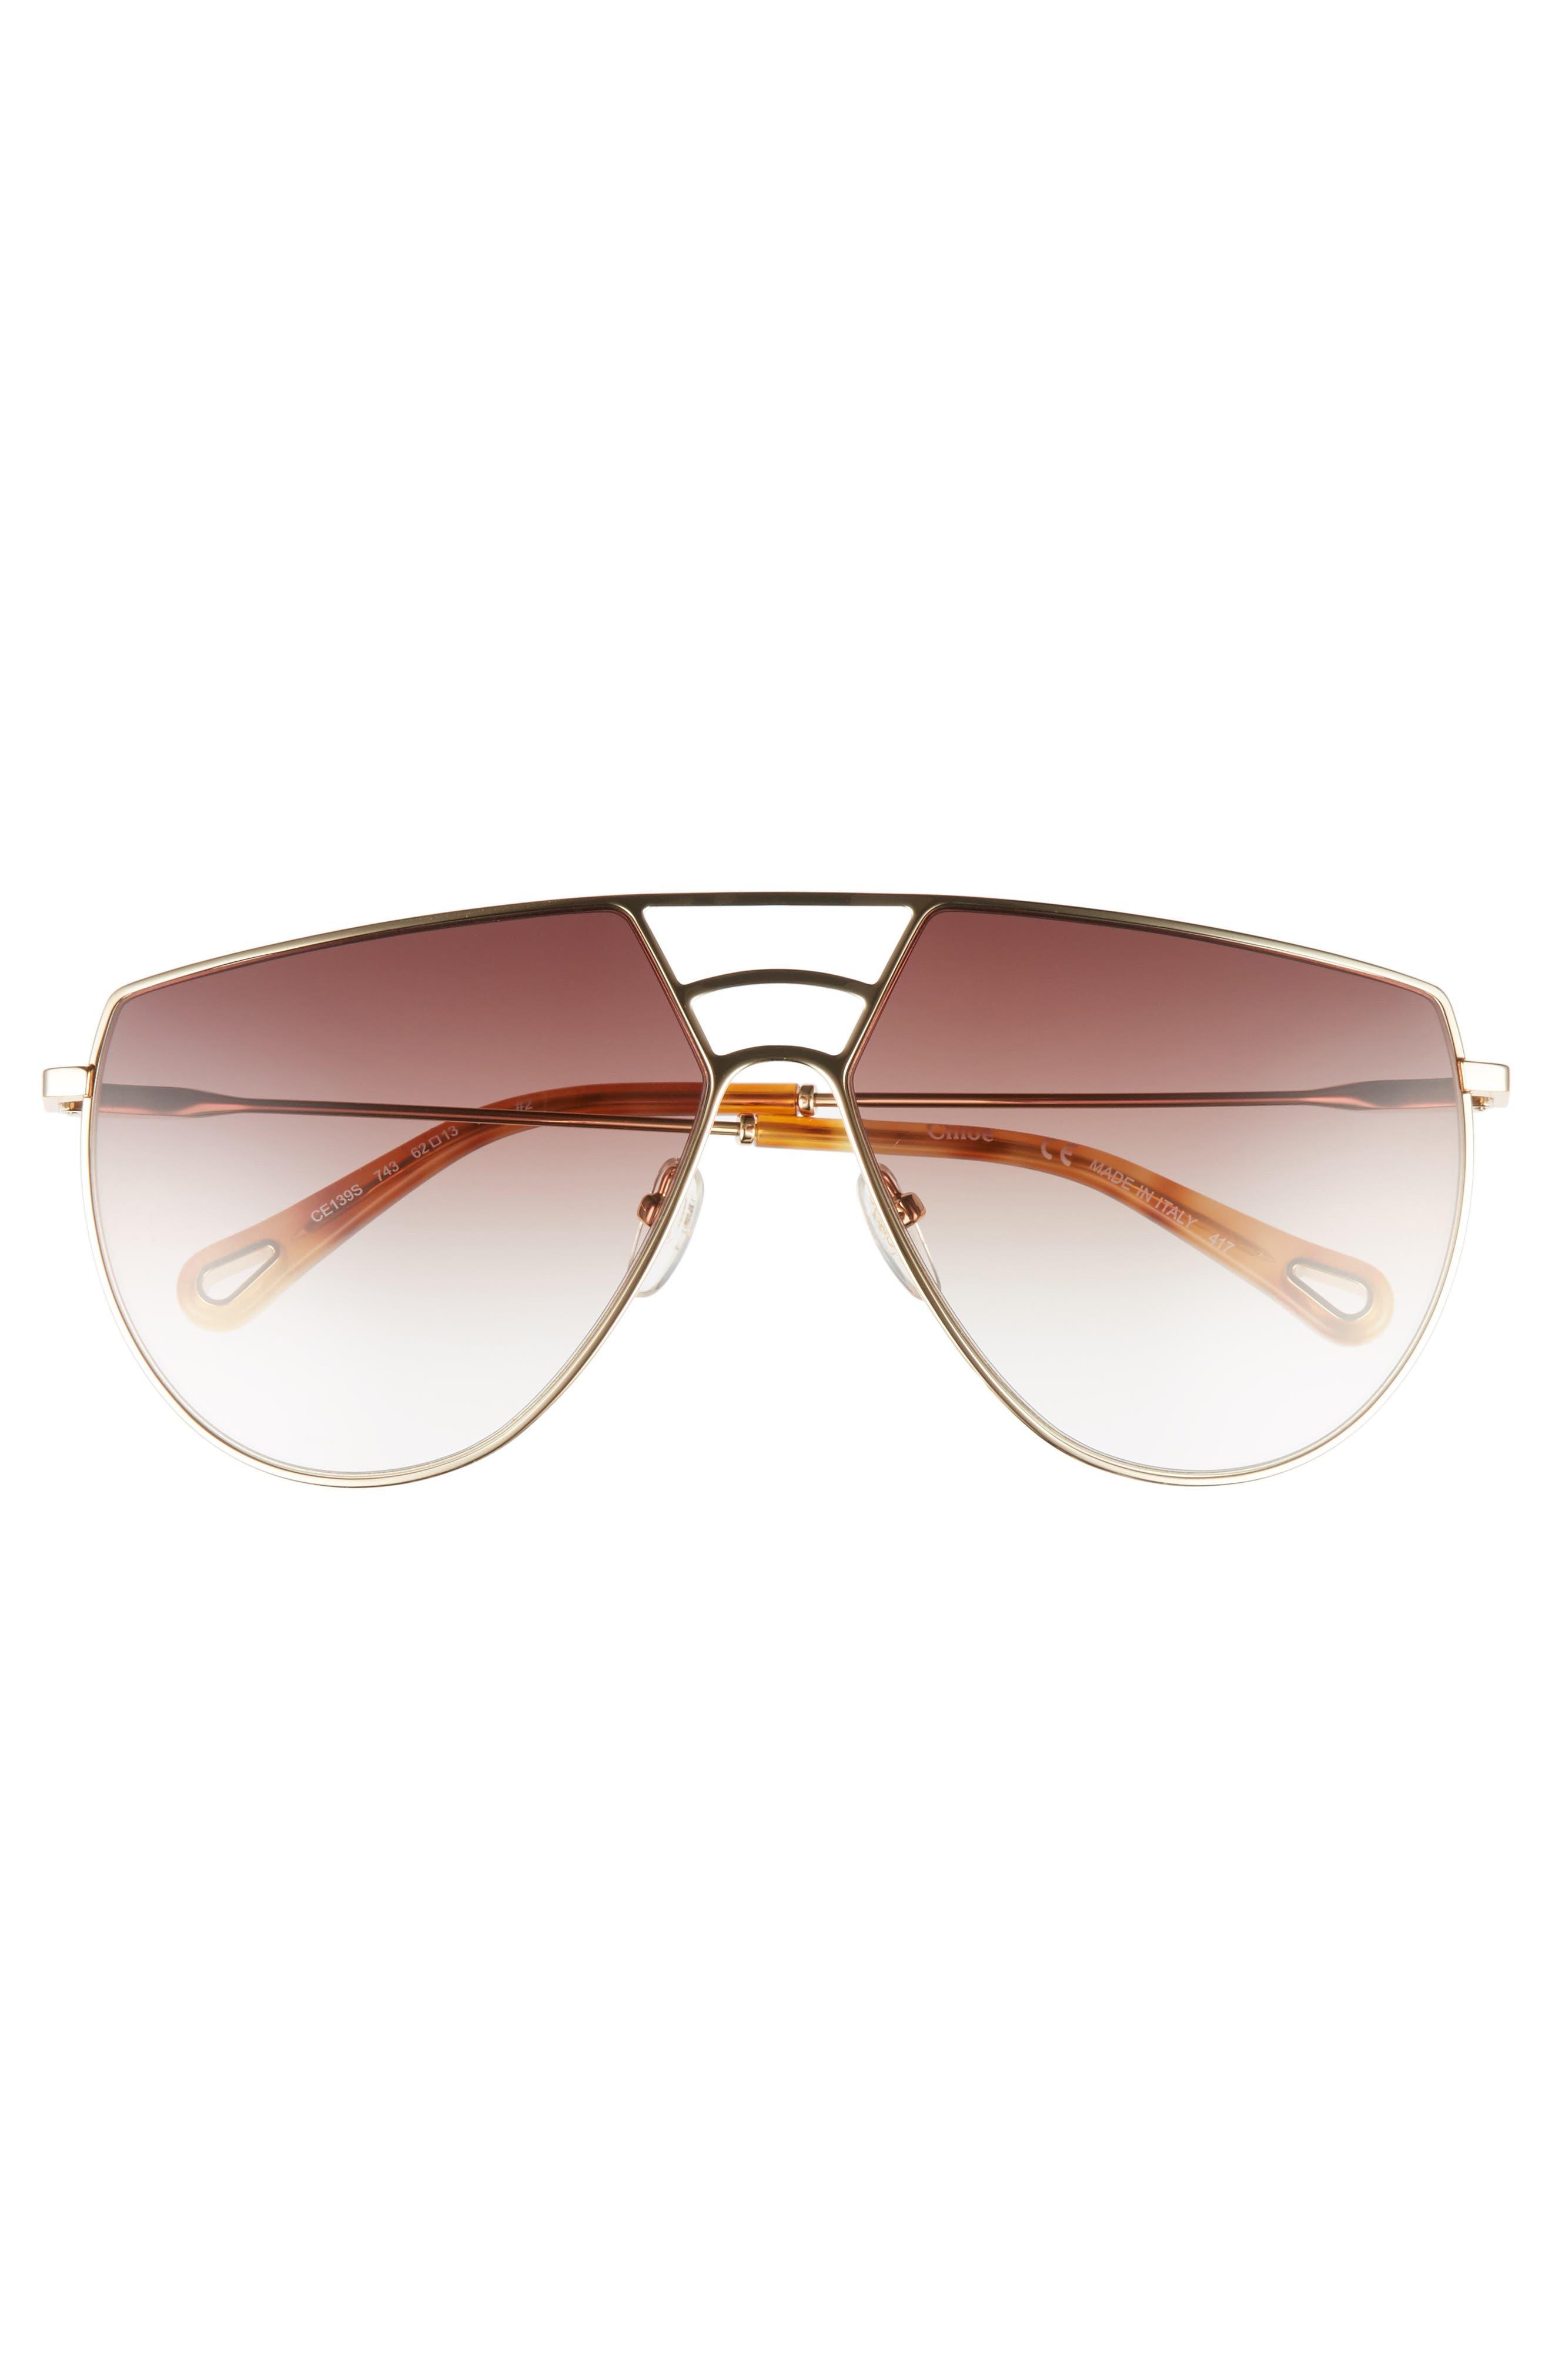 Negative Space 62mm Oversize Aviator Sunglasses,                             Alternate thumbnail 3, color,                             710